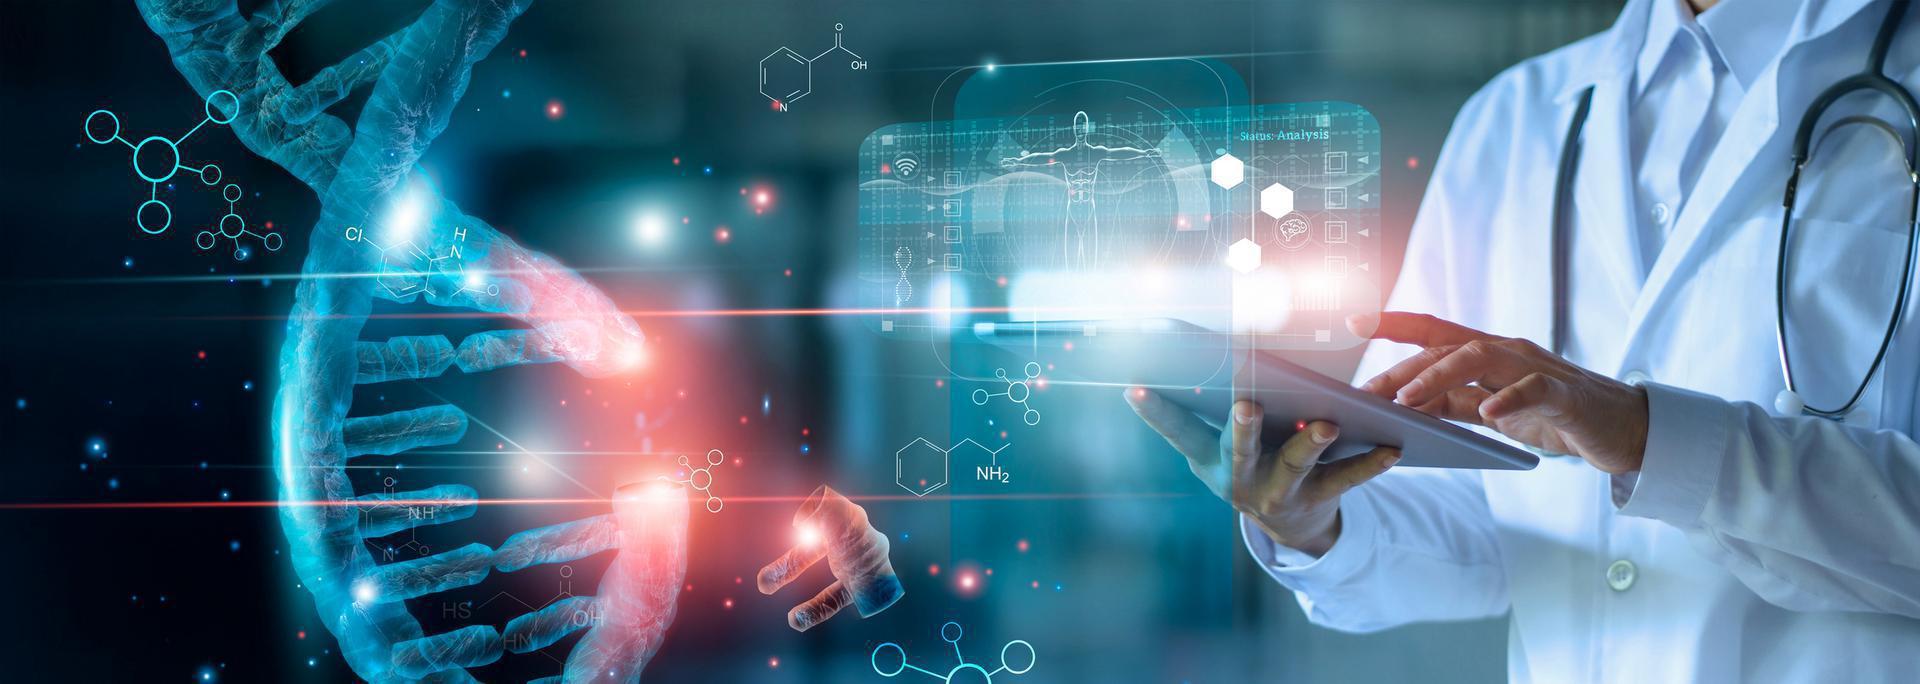 Drug Testing and DNA Testing - Layton UT - featured